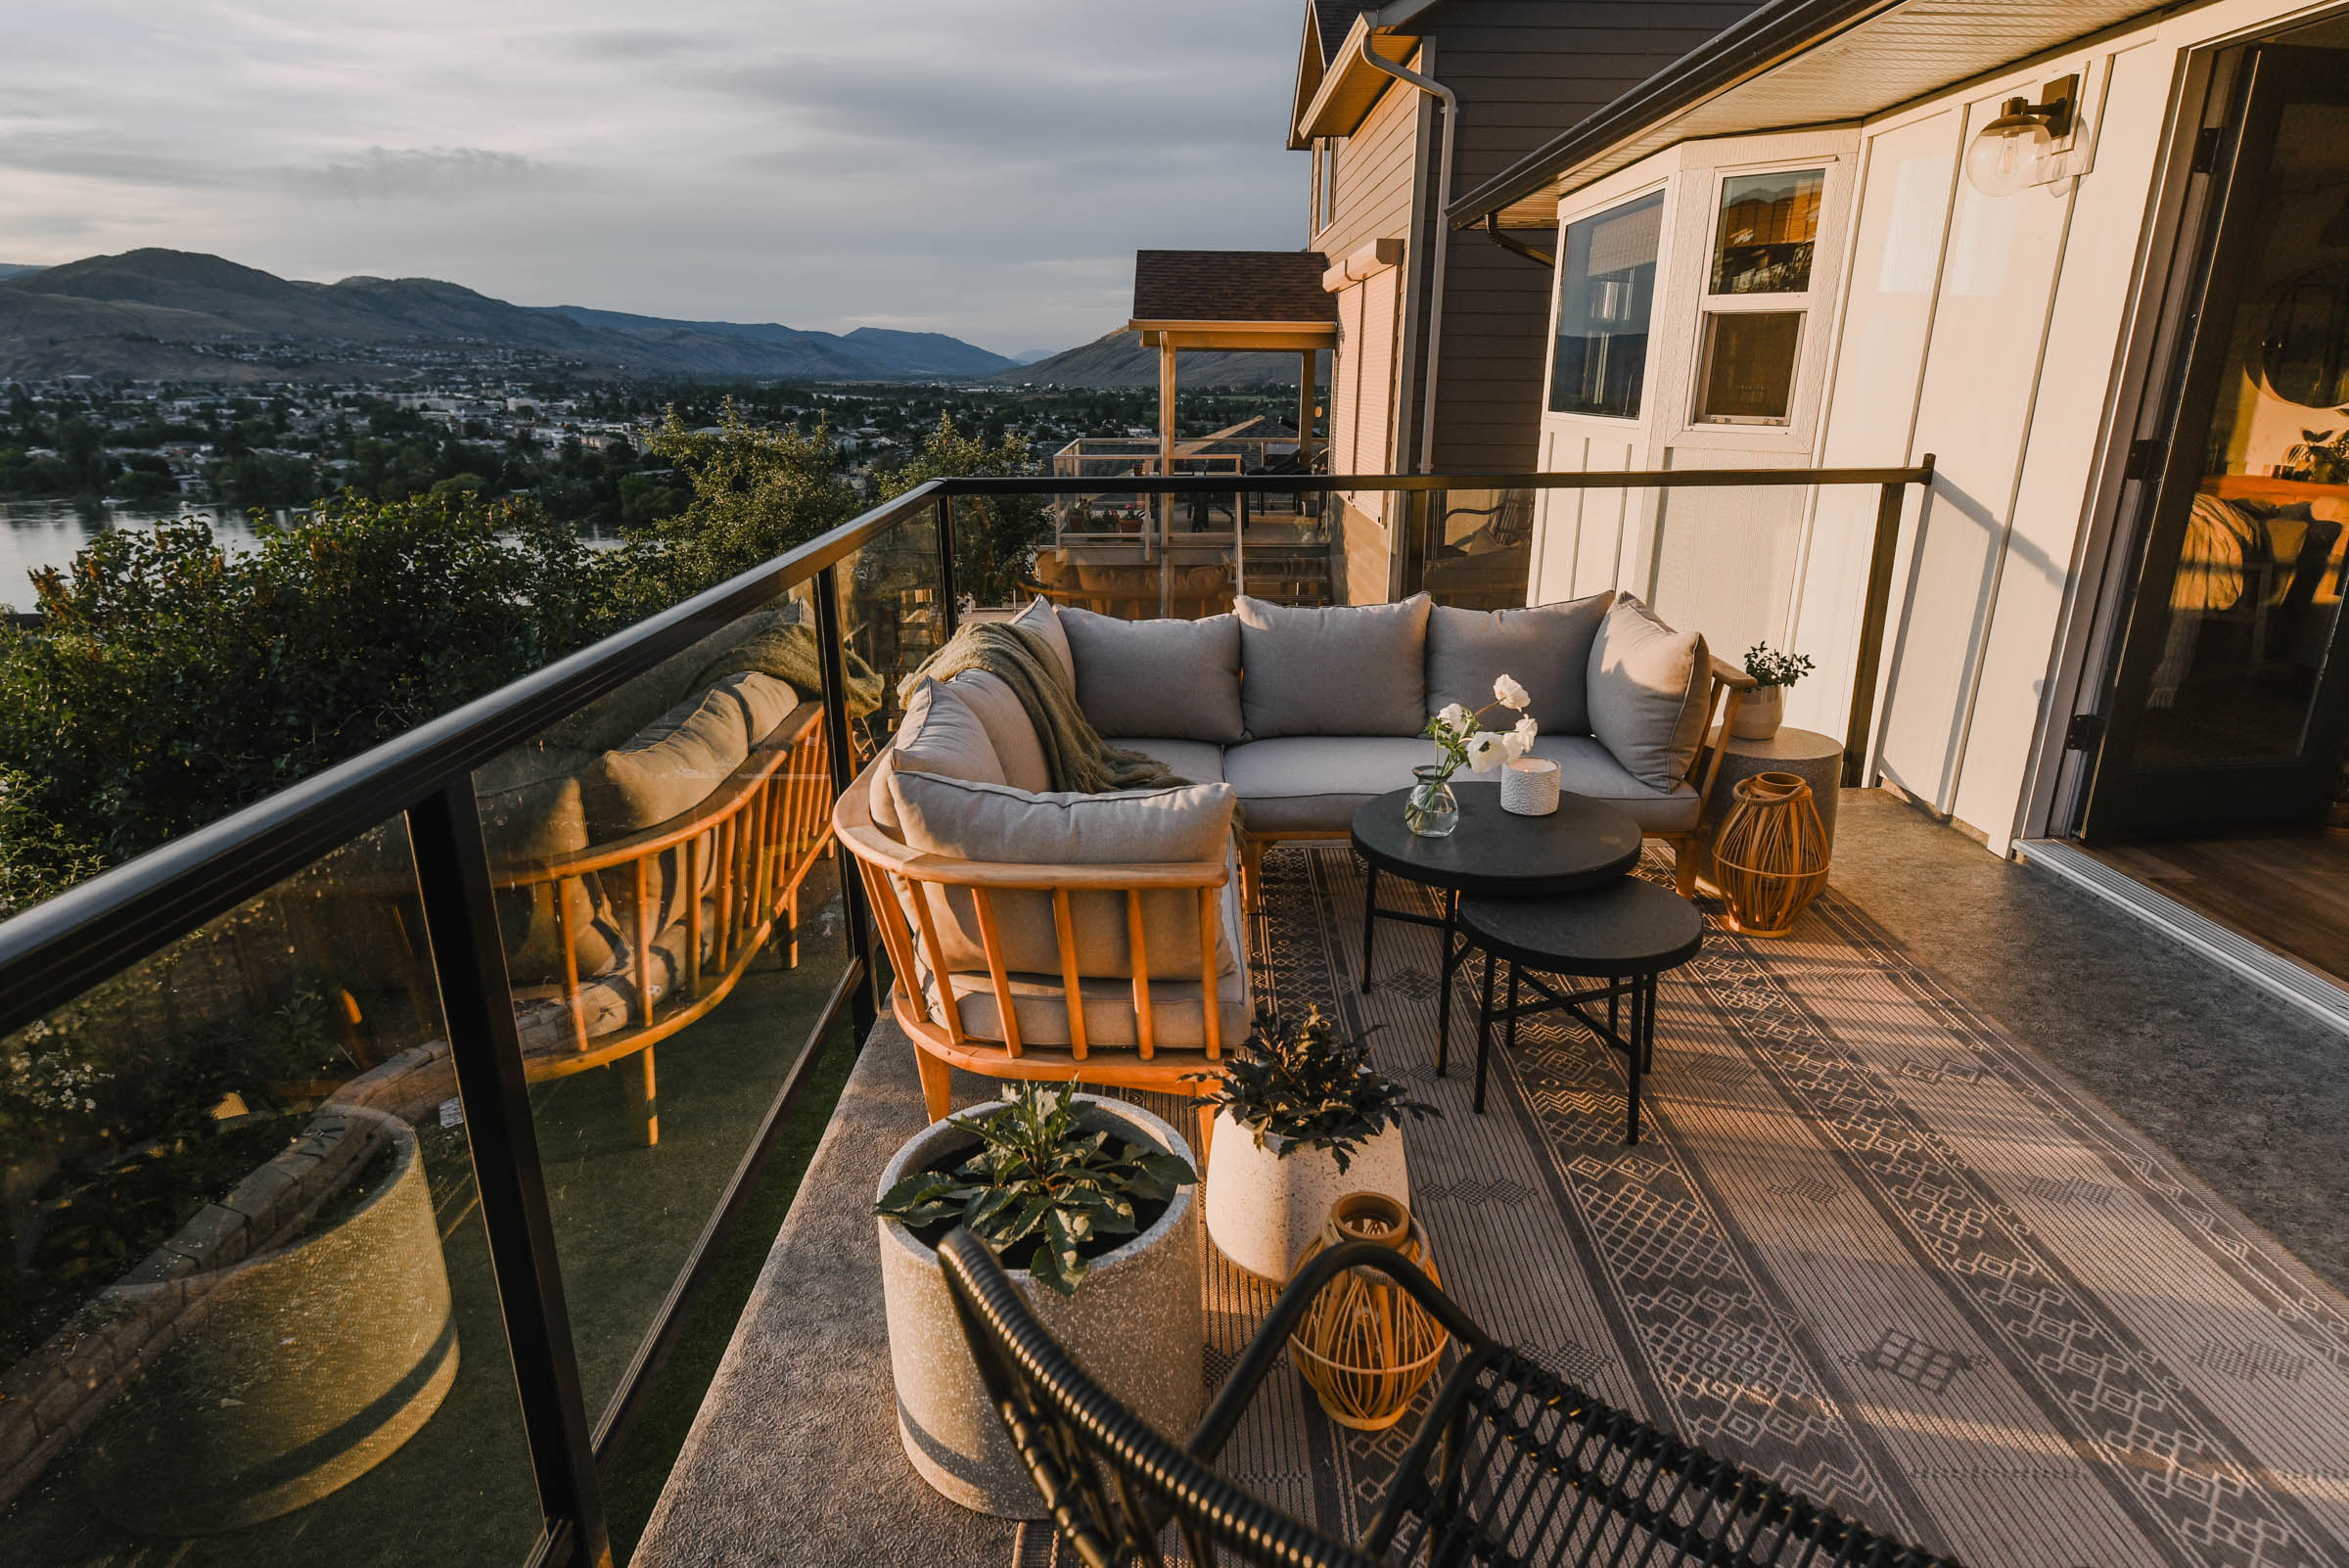 Cozy modern patio decor ideas